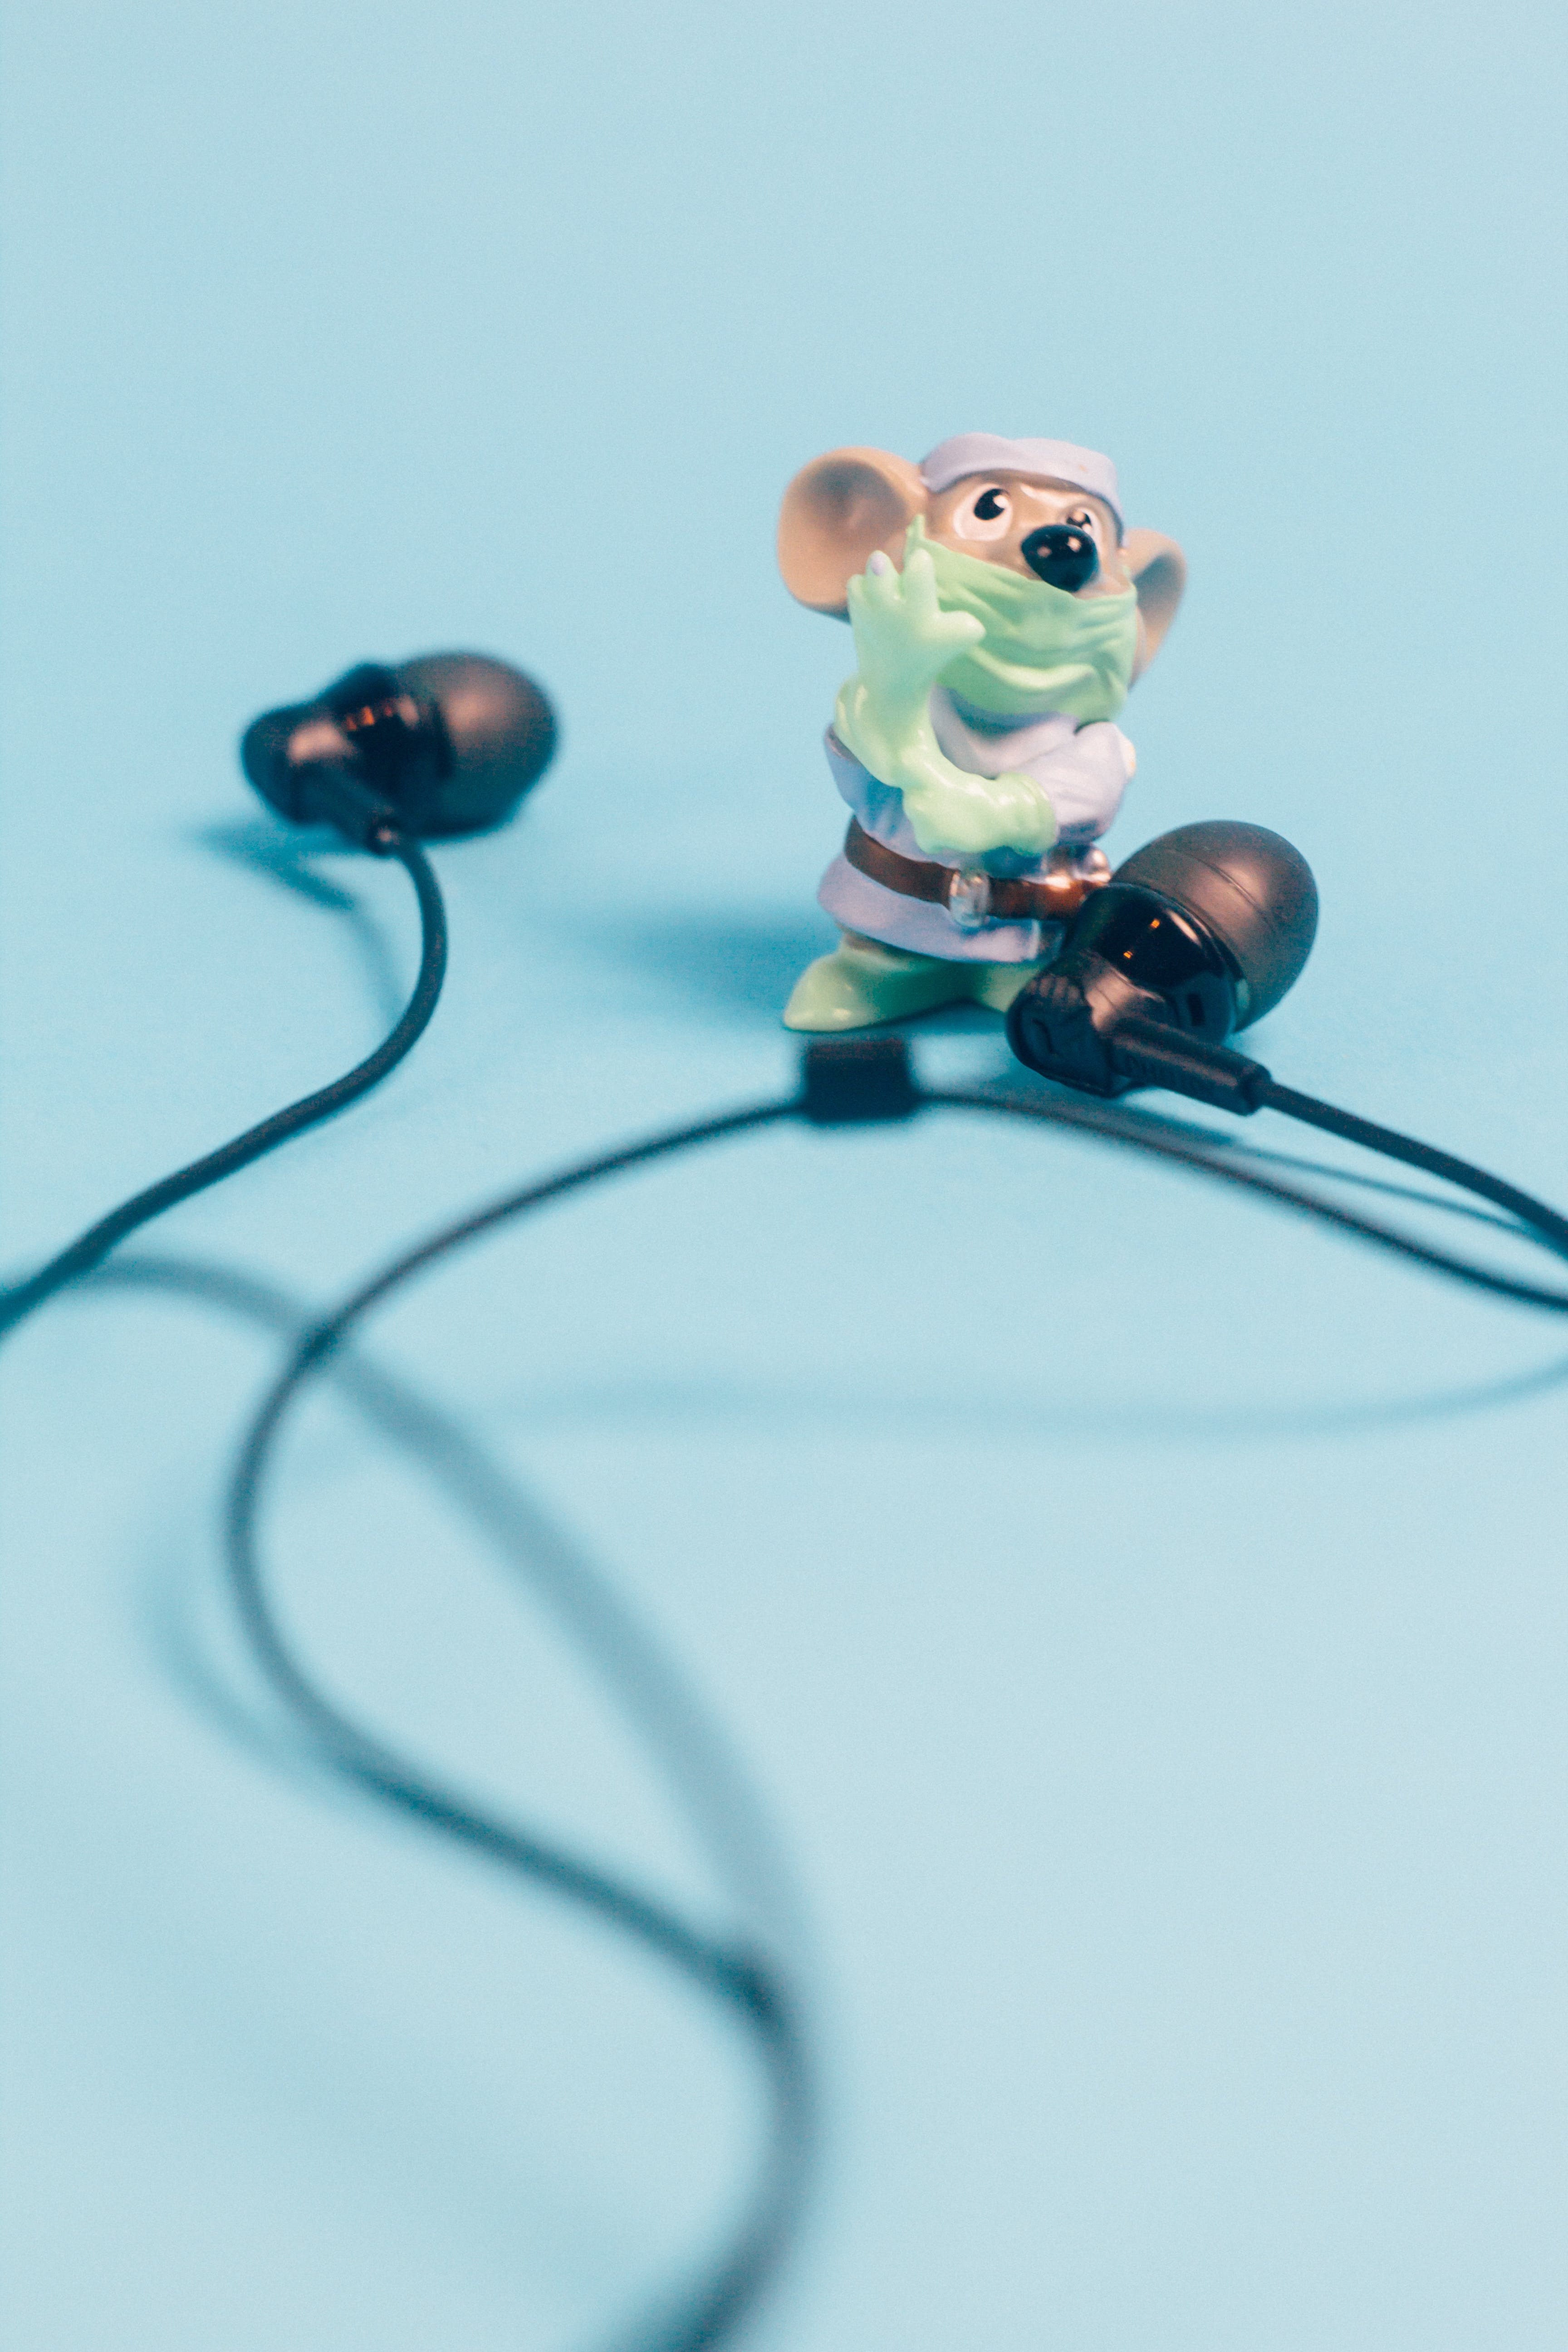 Free stock photo of night, doctor, headphones, equipment